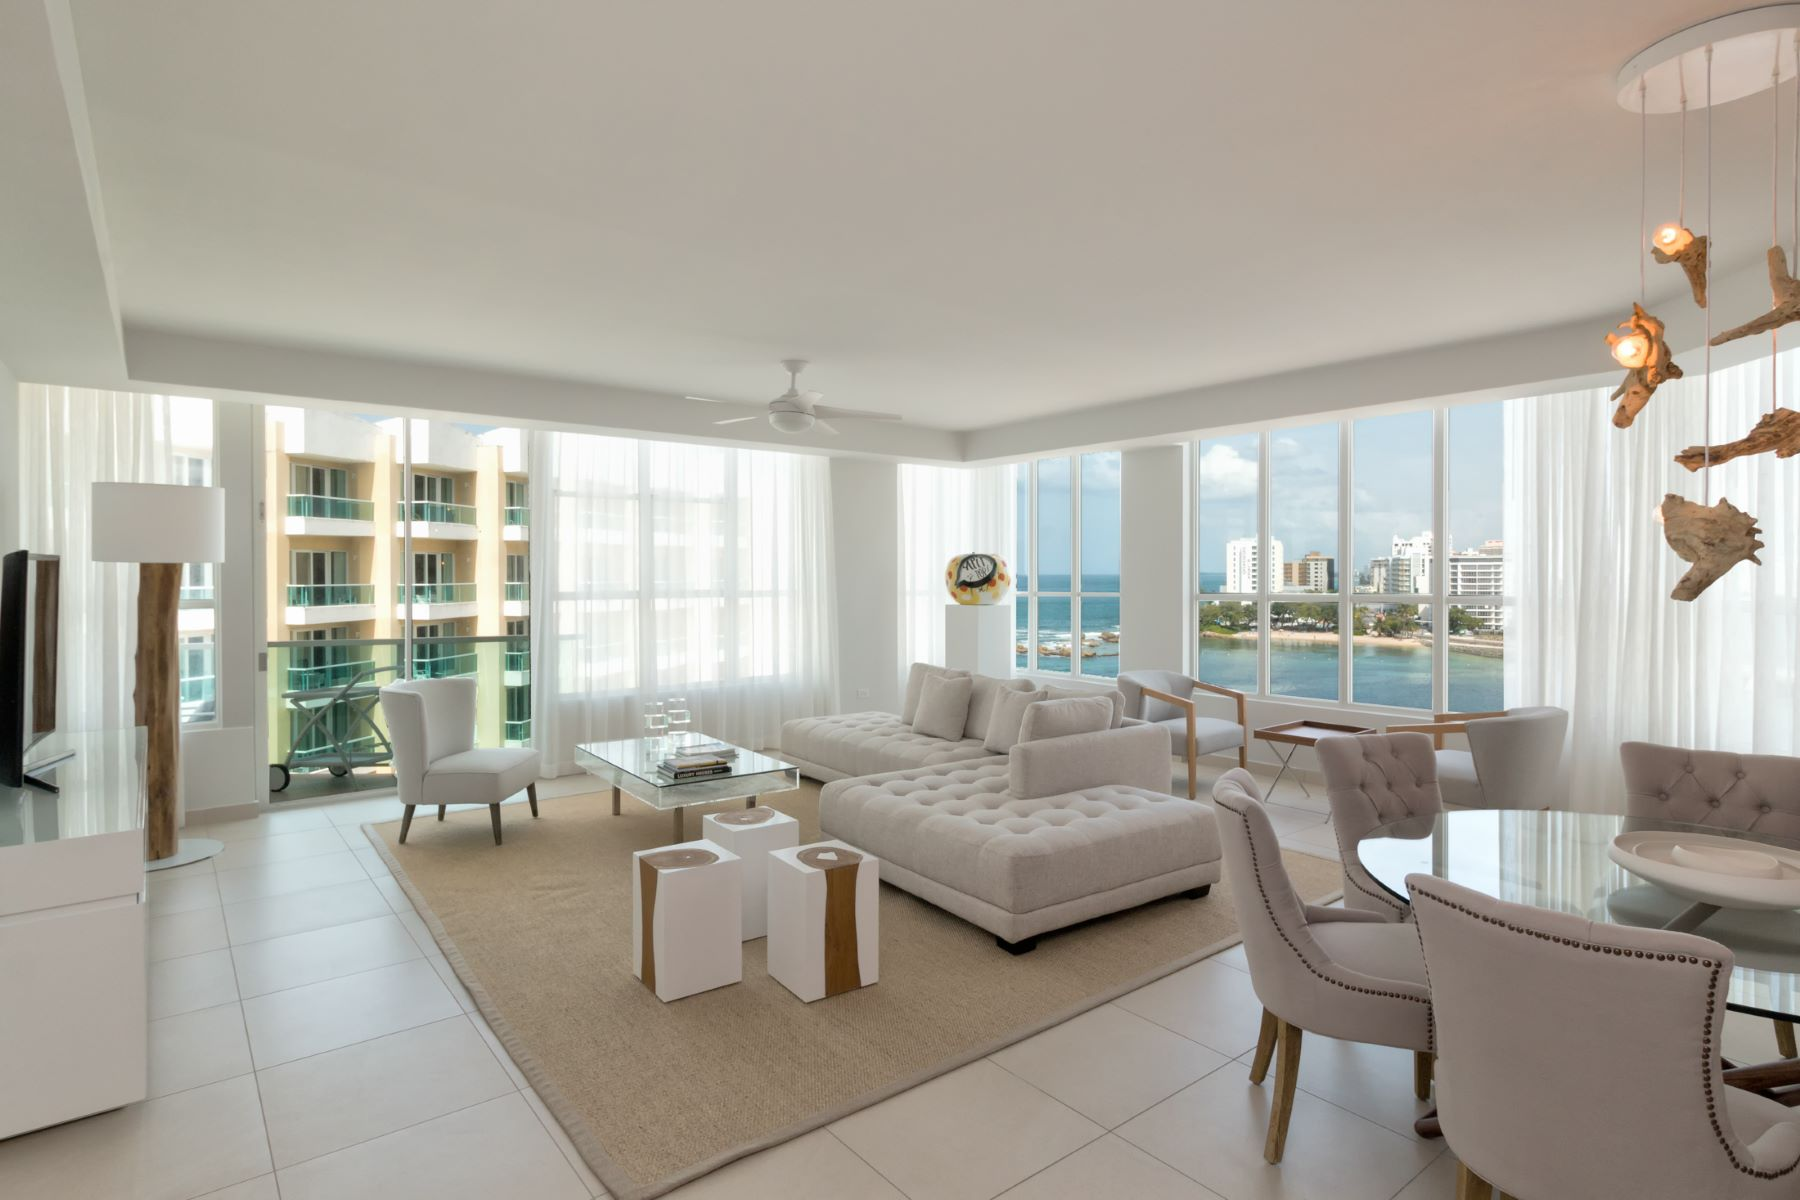 شقة للـ Rent في Sought After Top Floor Apartment at Bahia Plaza 25 Muñoz Rivera Ave. Apt. 911 San Juan, Puerto Rico 00901 Puerto Rico